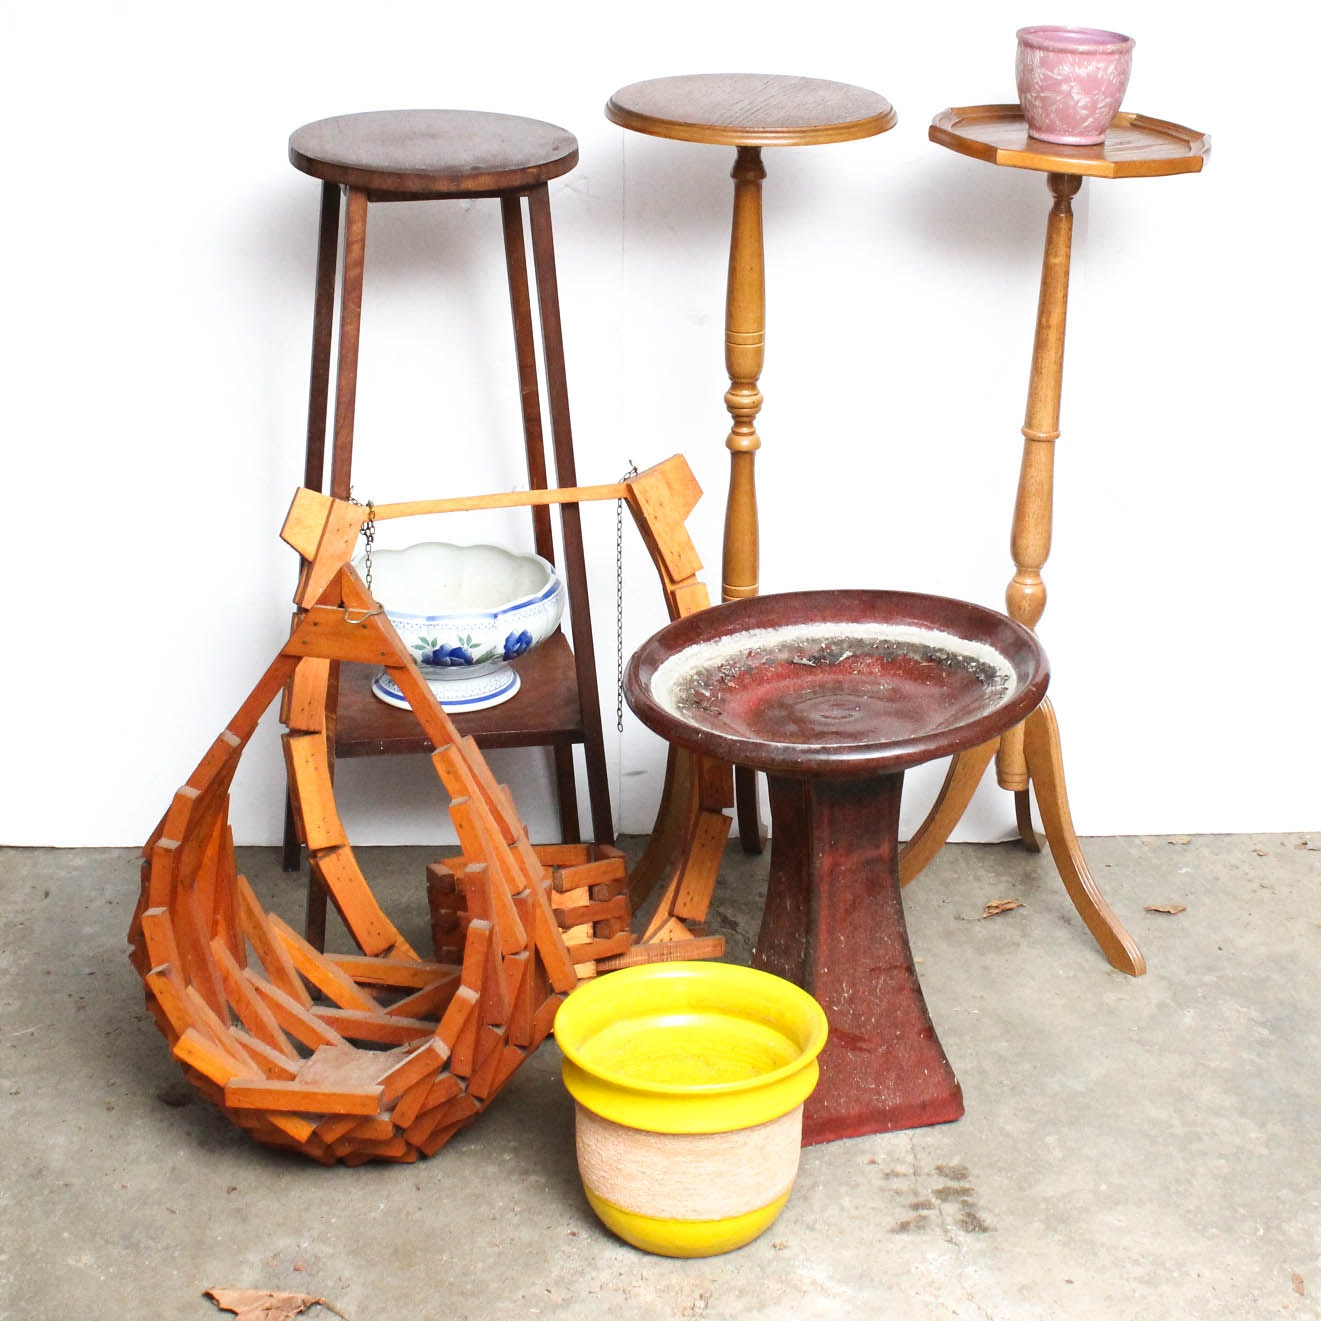 Plant Stands, Hanging Baskets and Birdbath